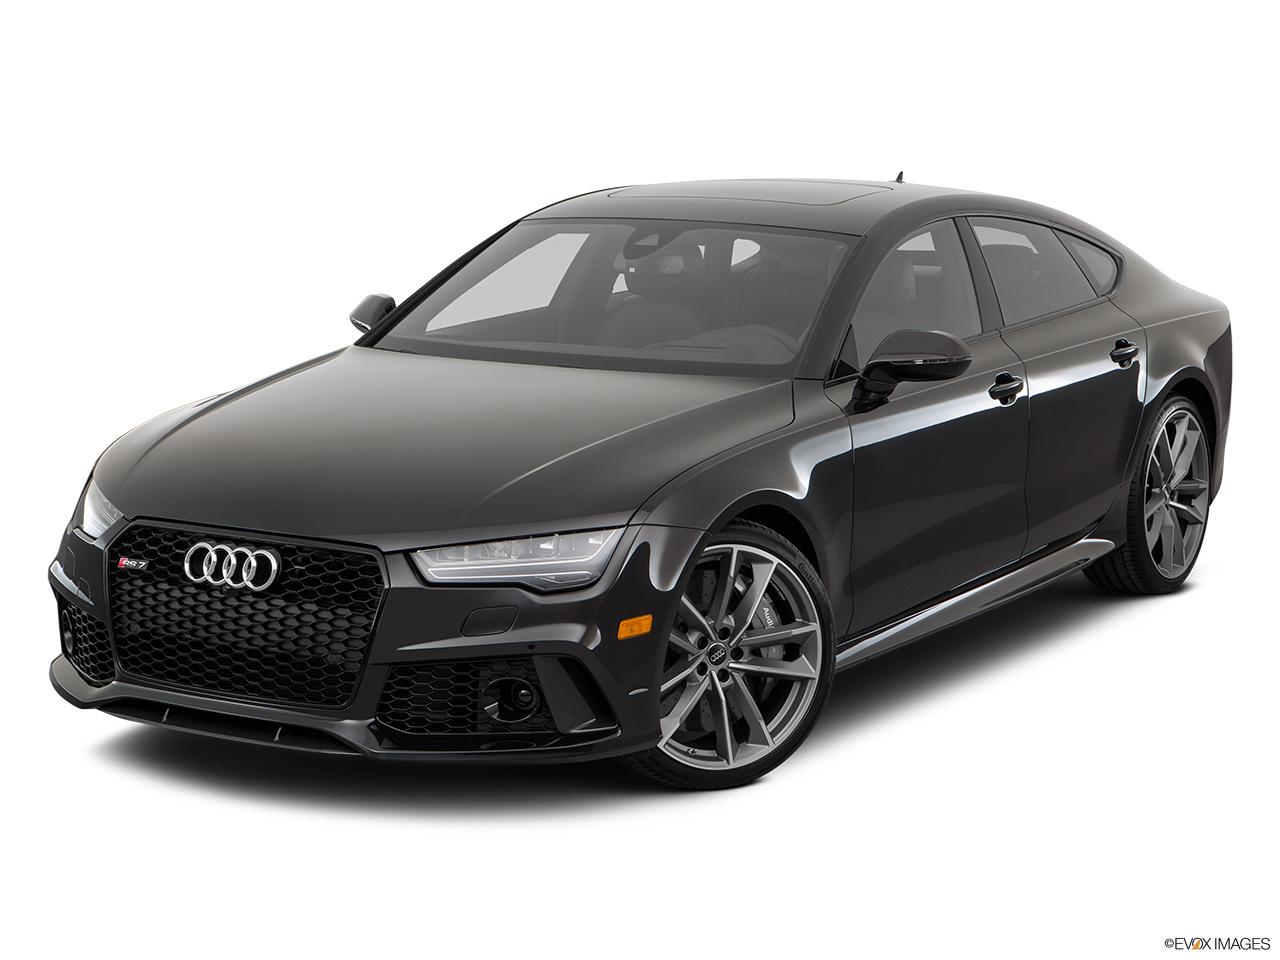 2018 Audi RS7 Prices In Saudi Arabia, Gulf Specs & Reviews